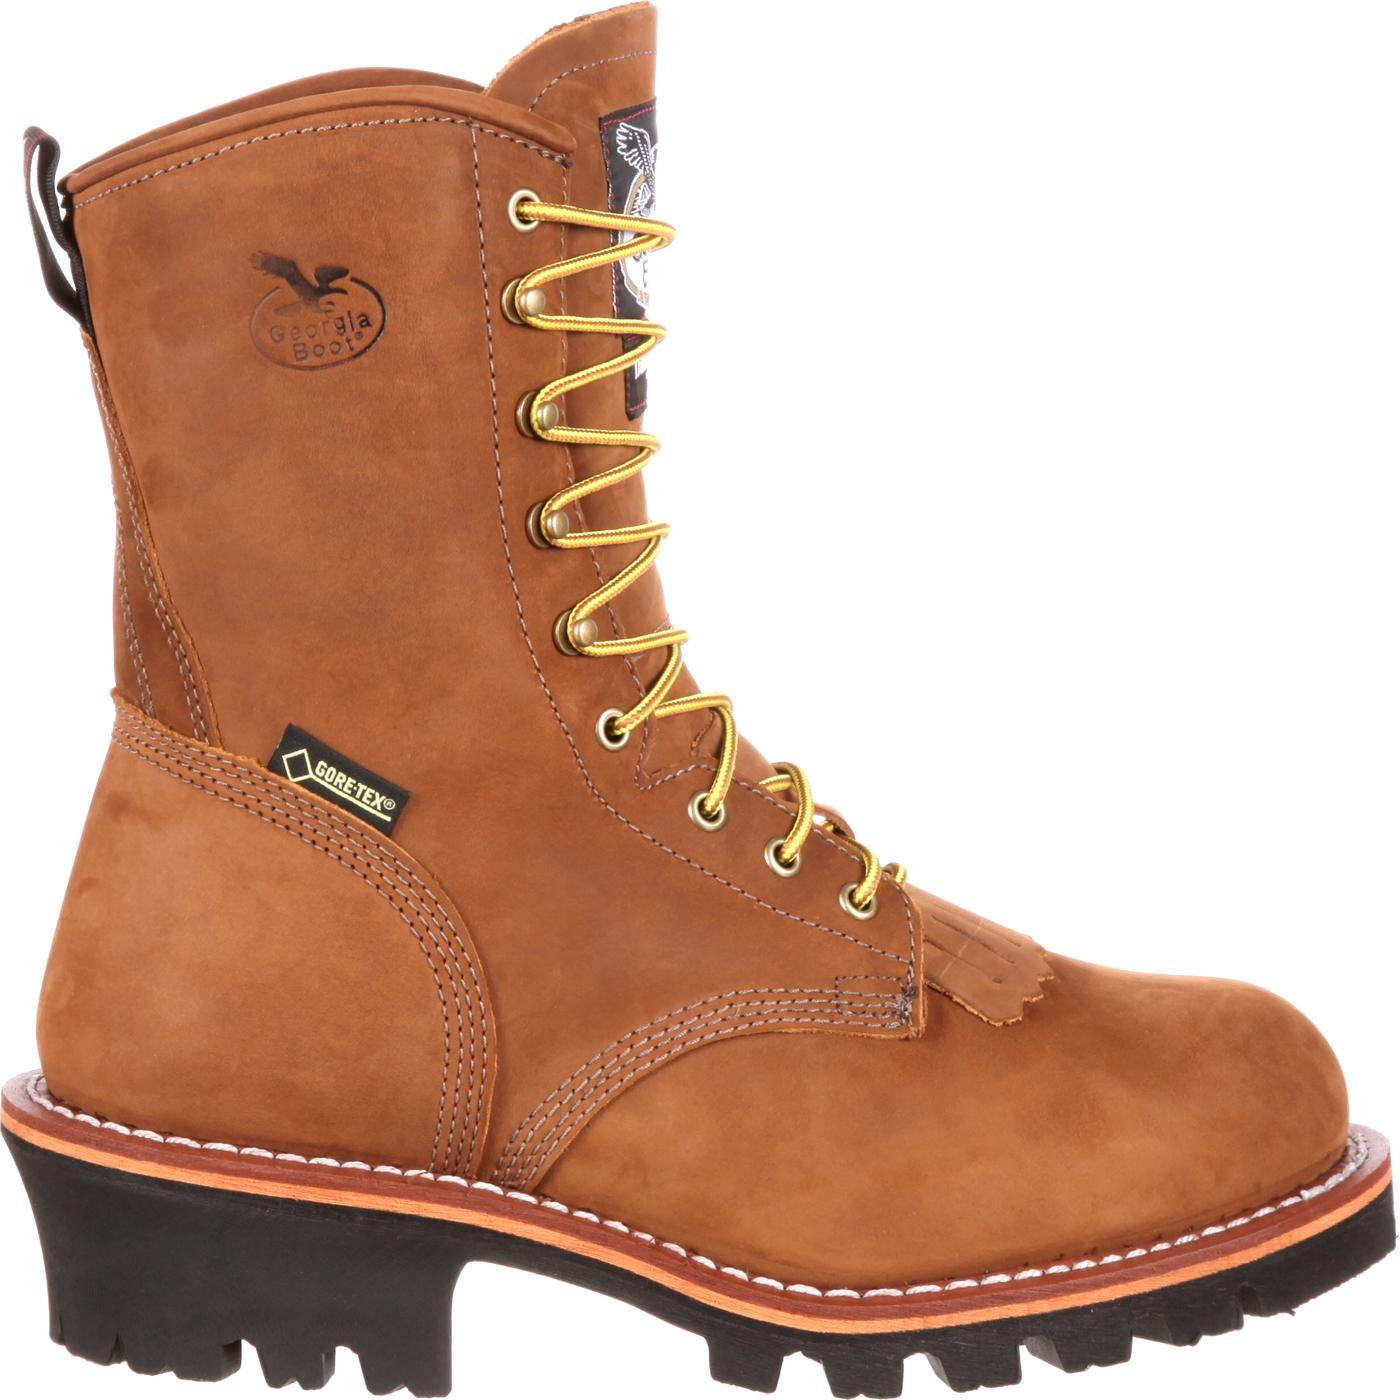 8e757d43714 Georgia Boot Steel Toe GORE-TEX® Waterproof Insulated Logger Boot